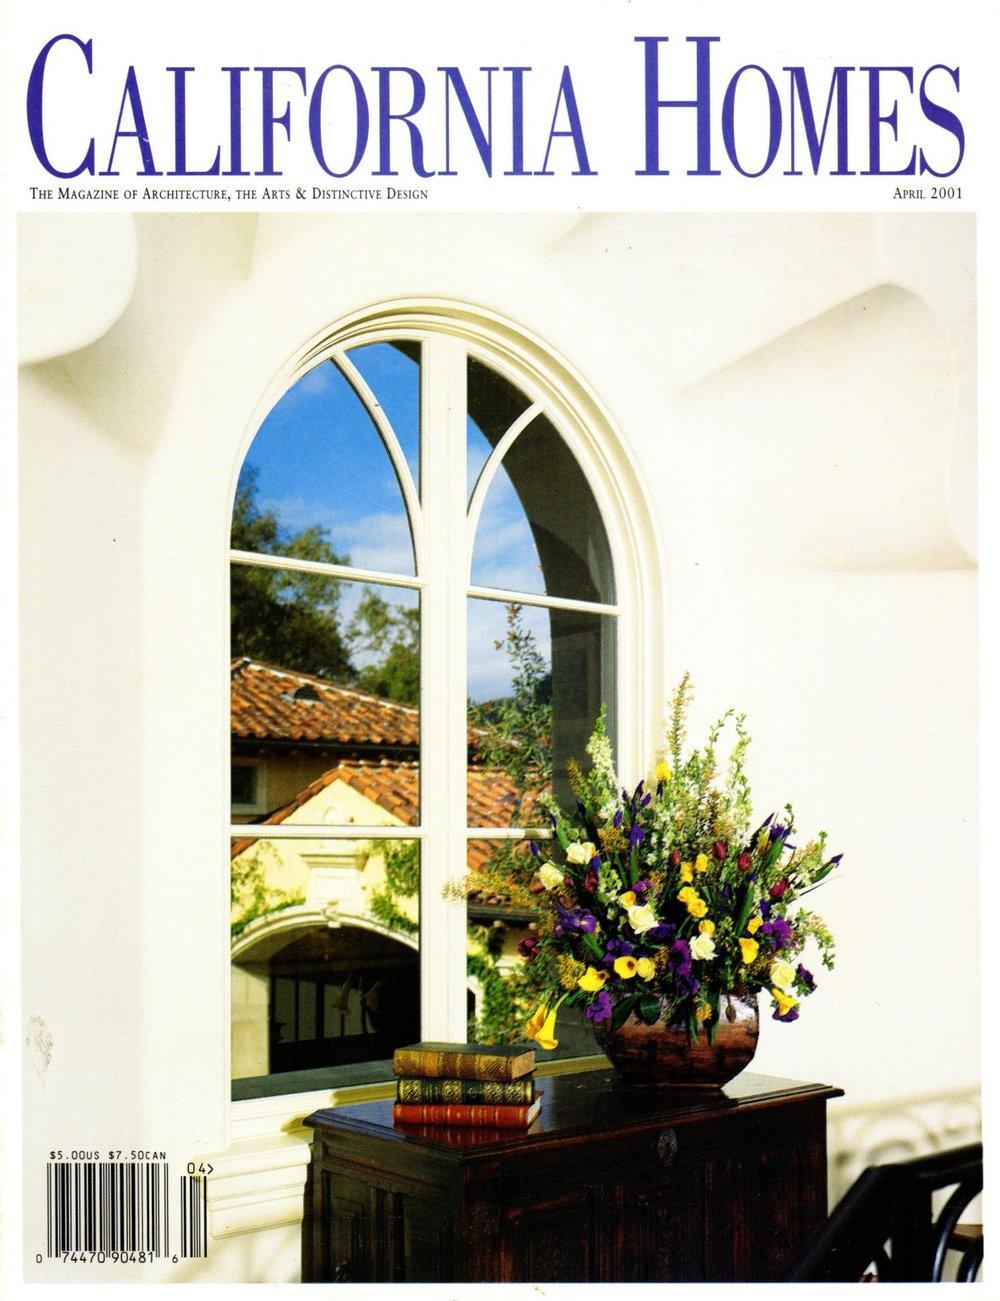 California Homes, April 2001